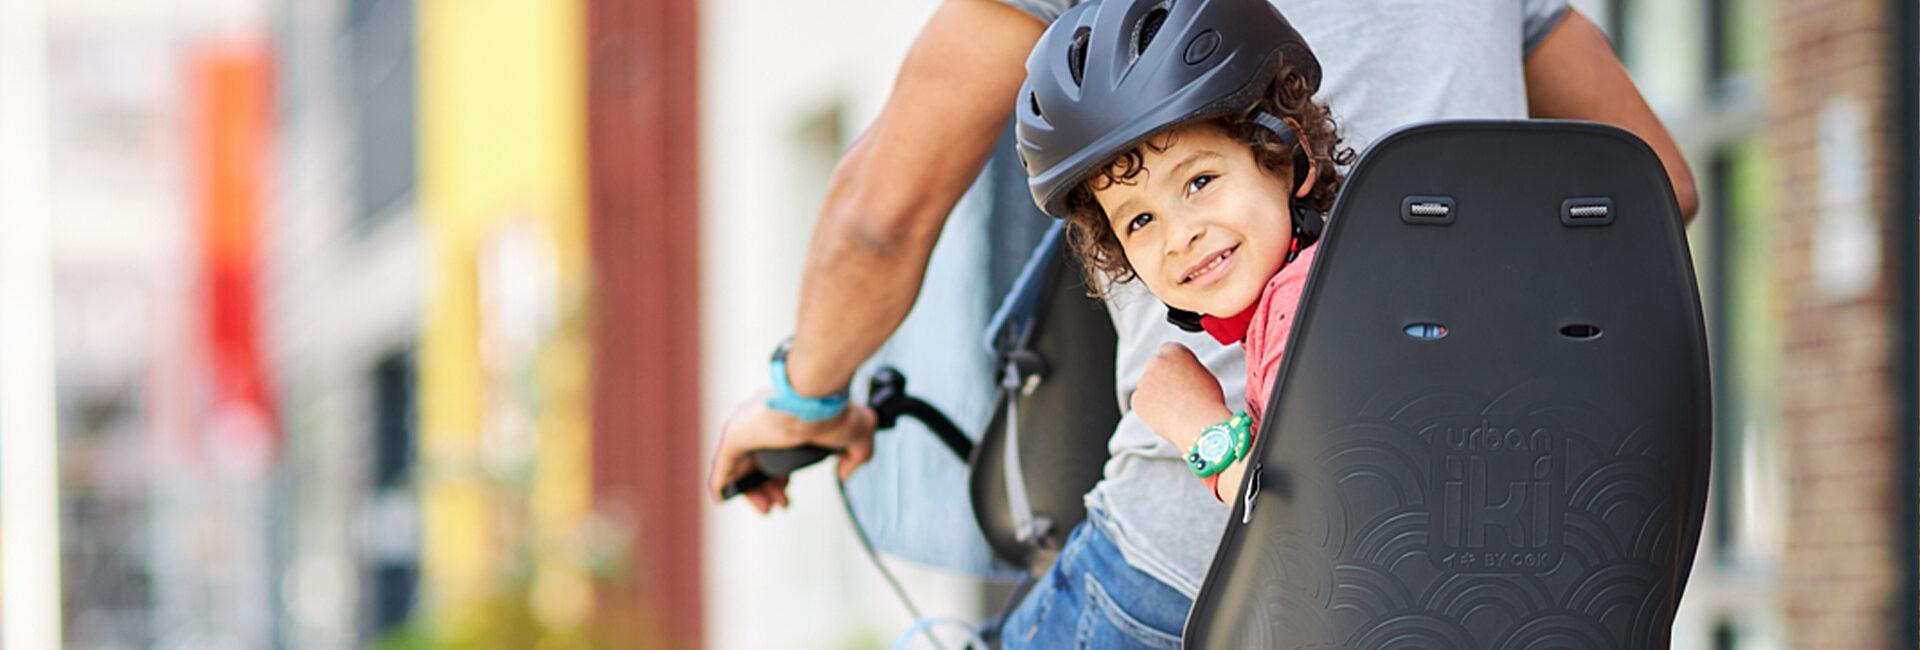 urban-iki-achterzitje-binchob-black-helm-fiets